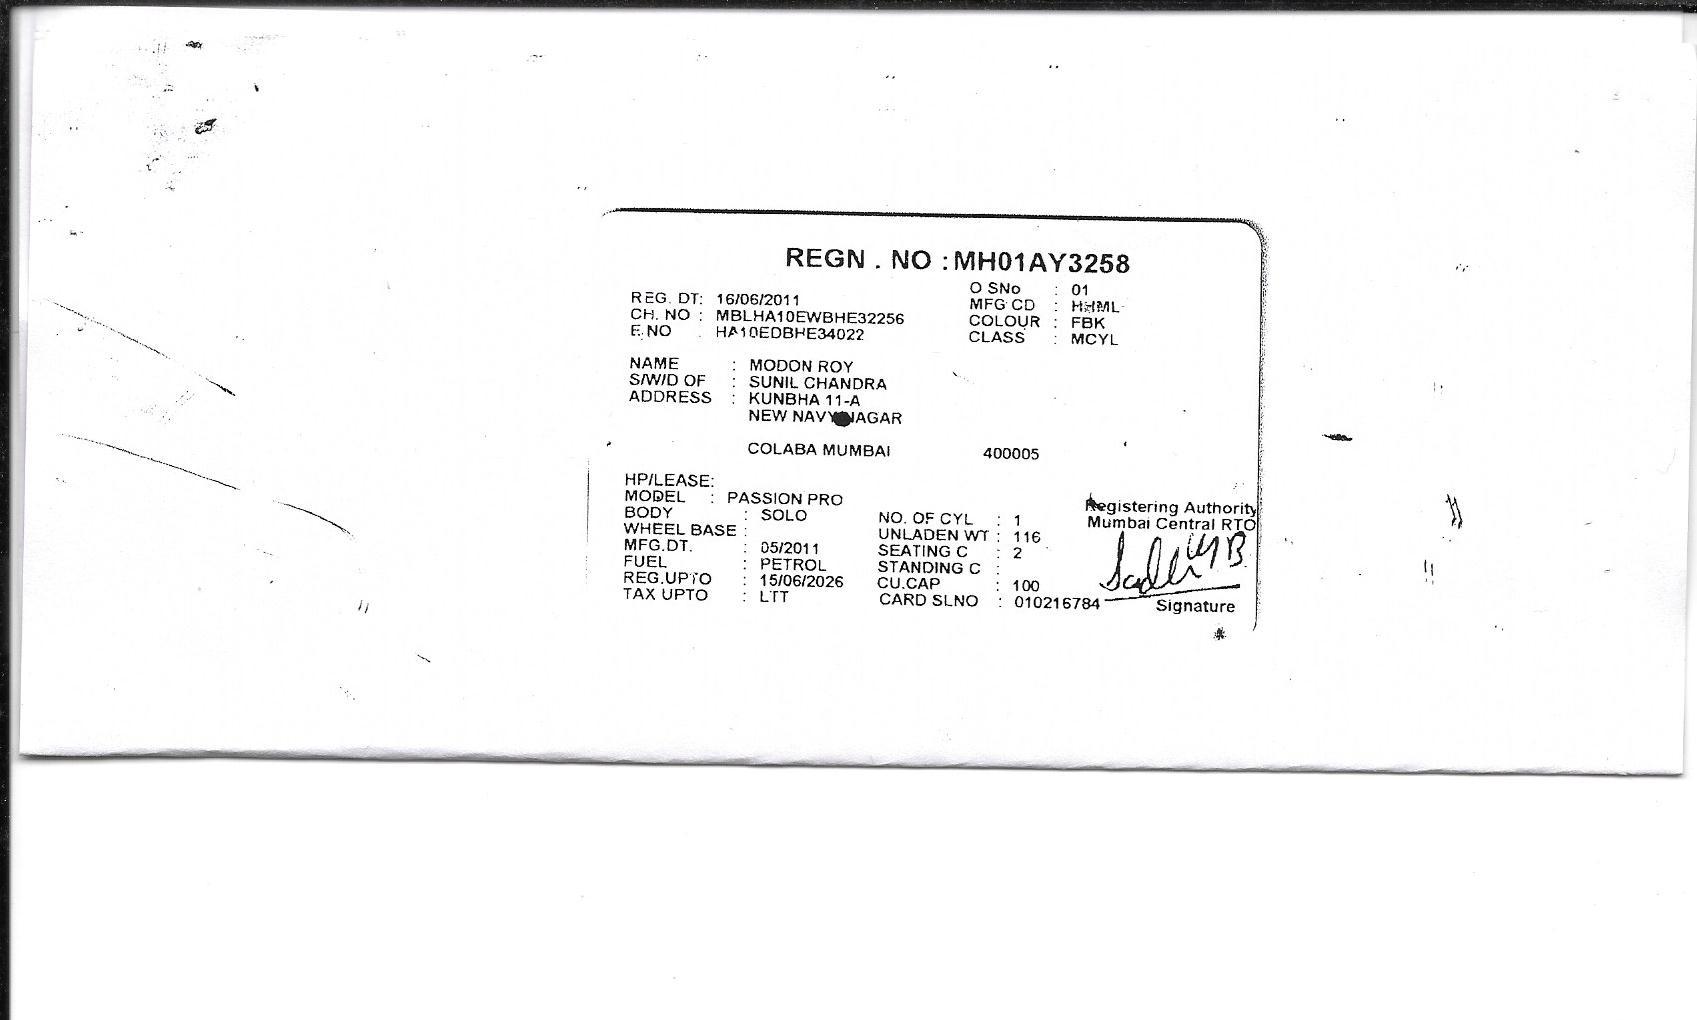 driving licence online apply karnataka